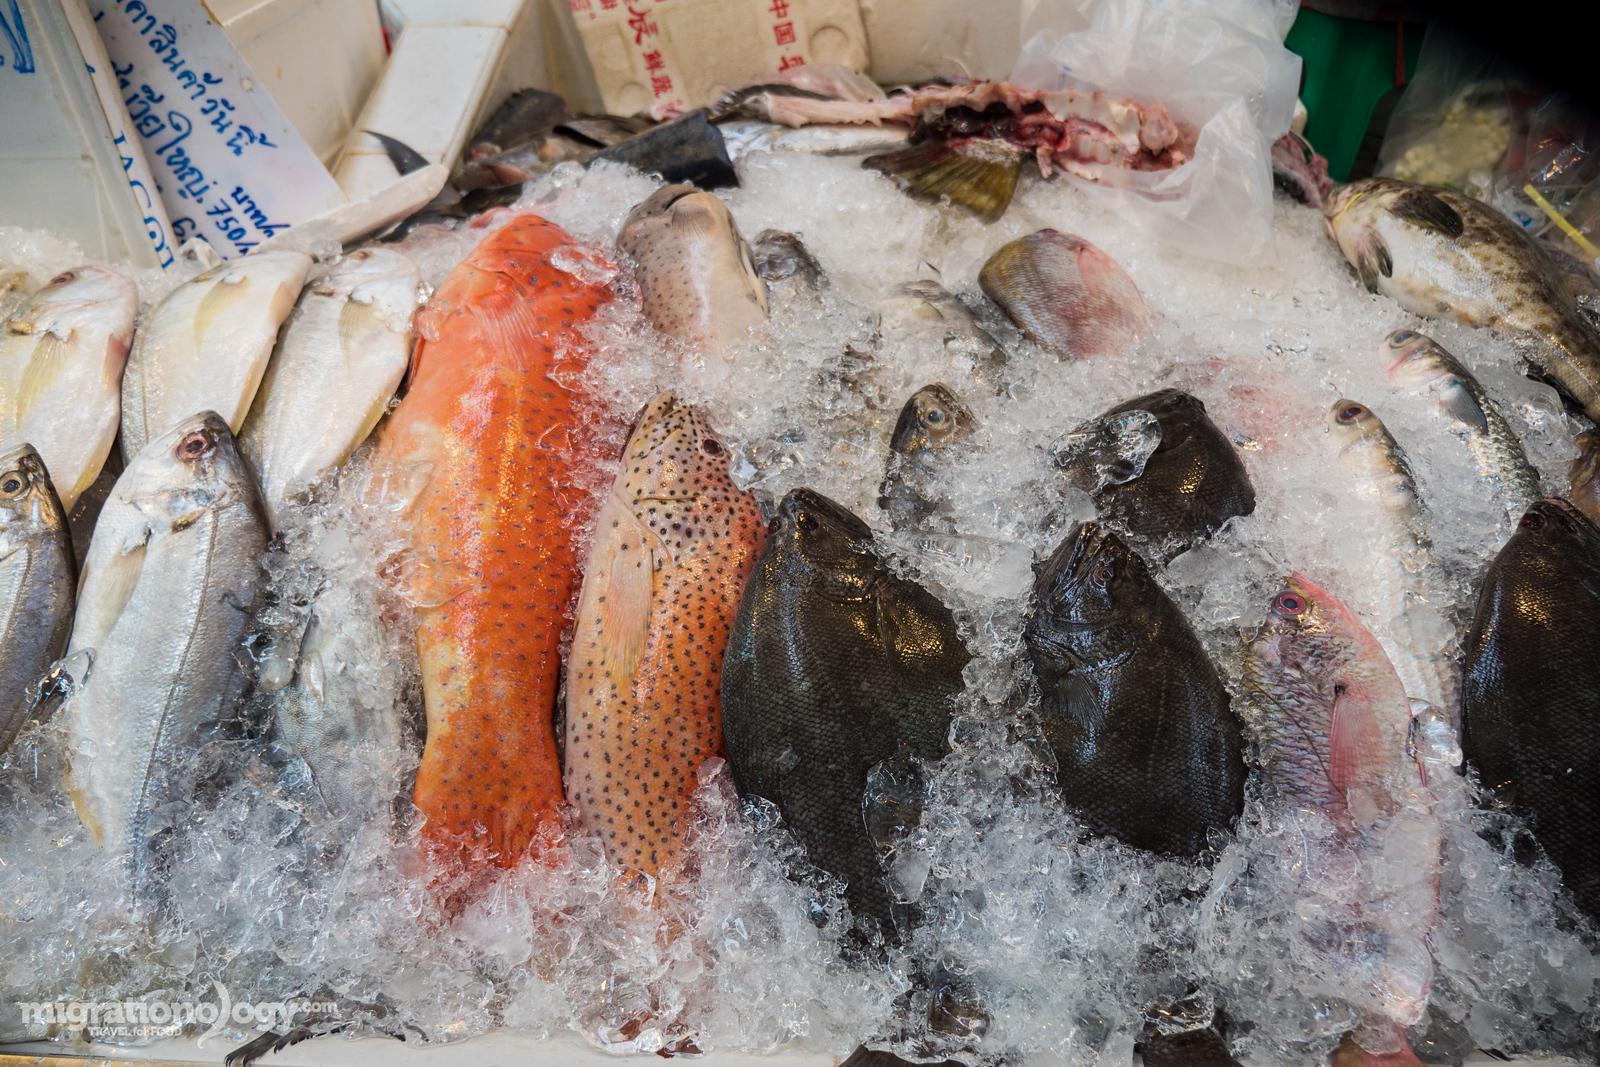 Or Tor Kor Market in Bangkok